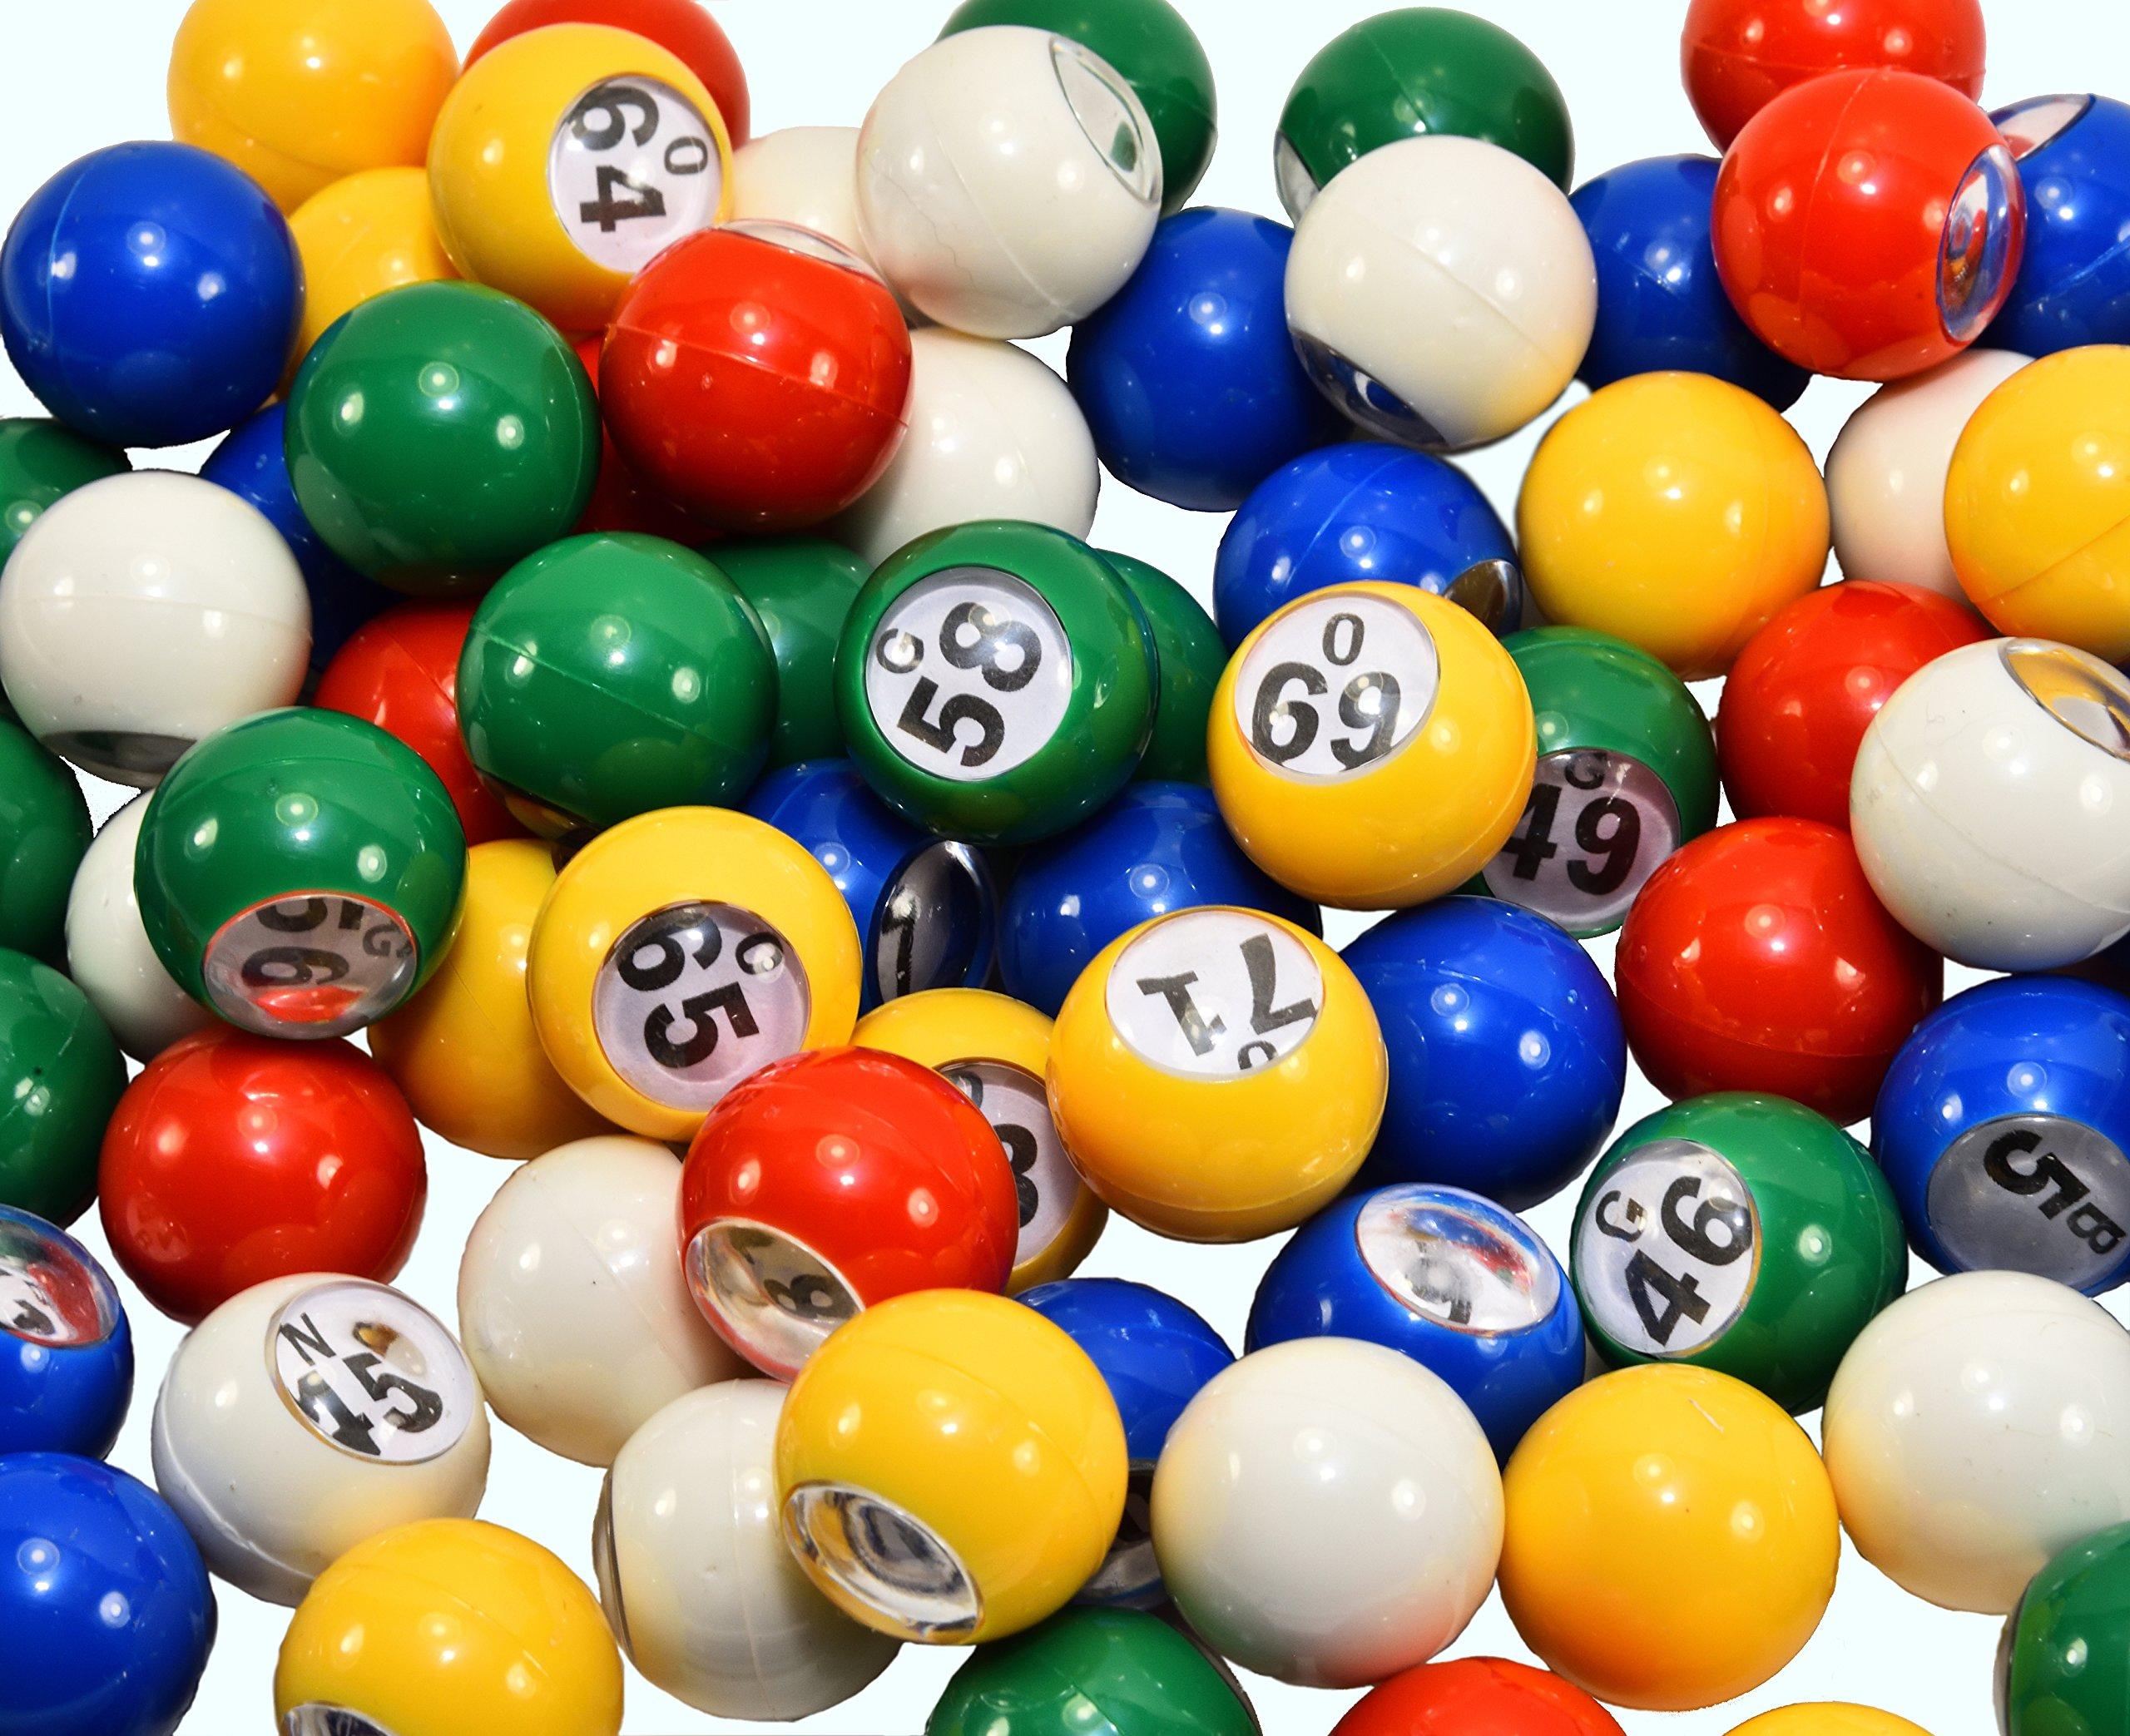 Regal Games 7/8 Premium Multi Color Replacement Bingo Balls with Easy Read Window (For 12'' Bingo Cage)